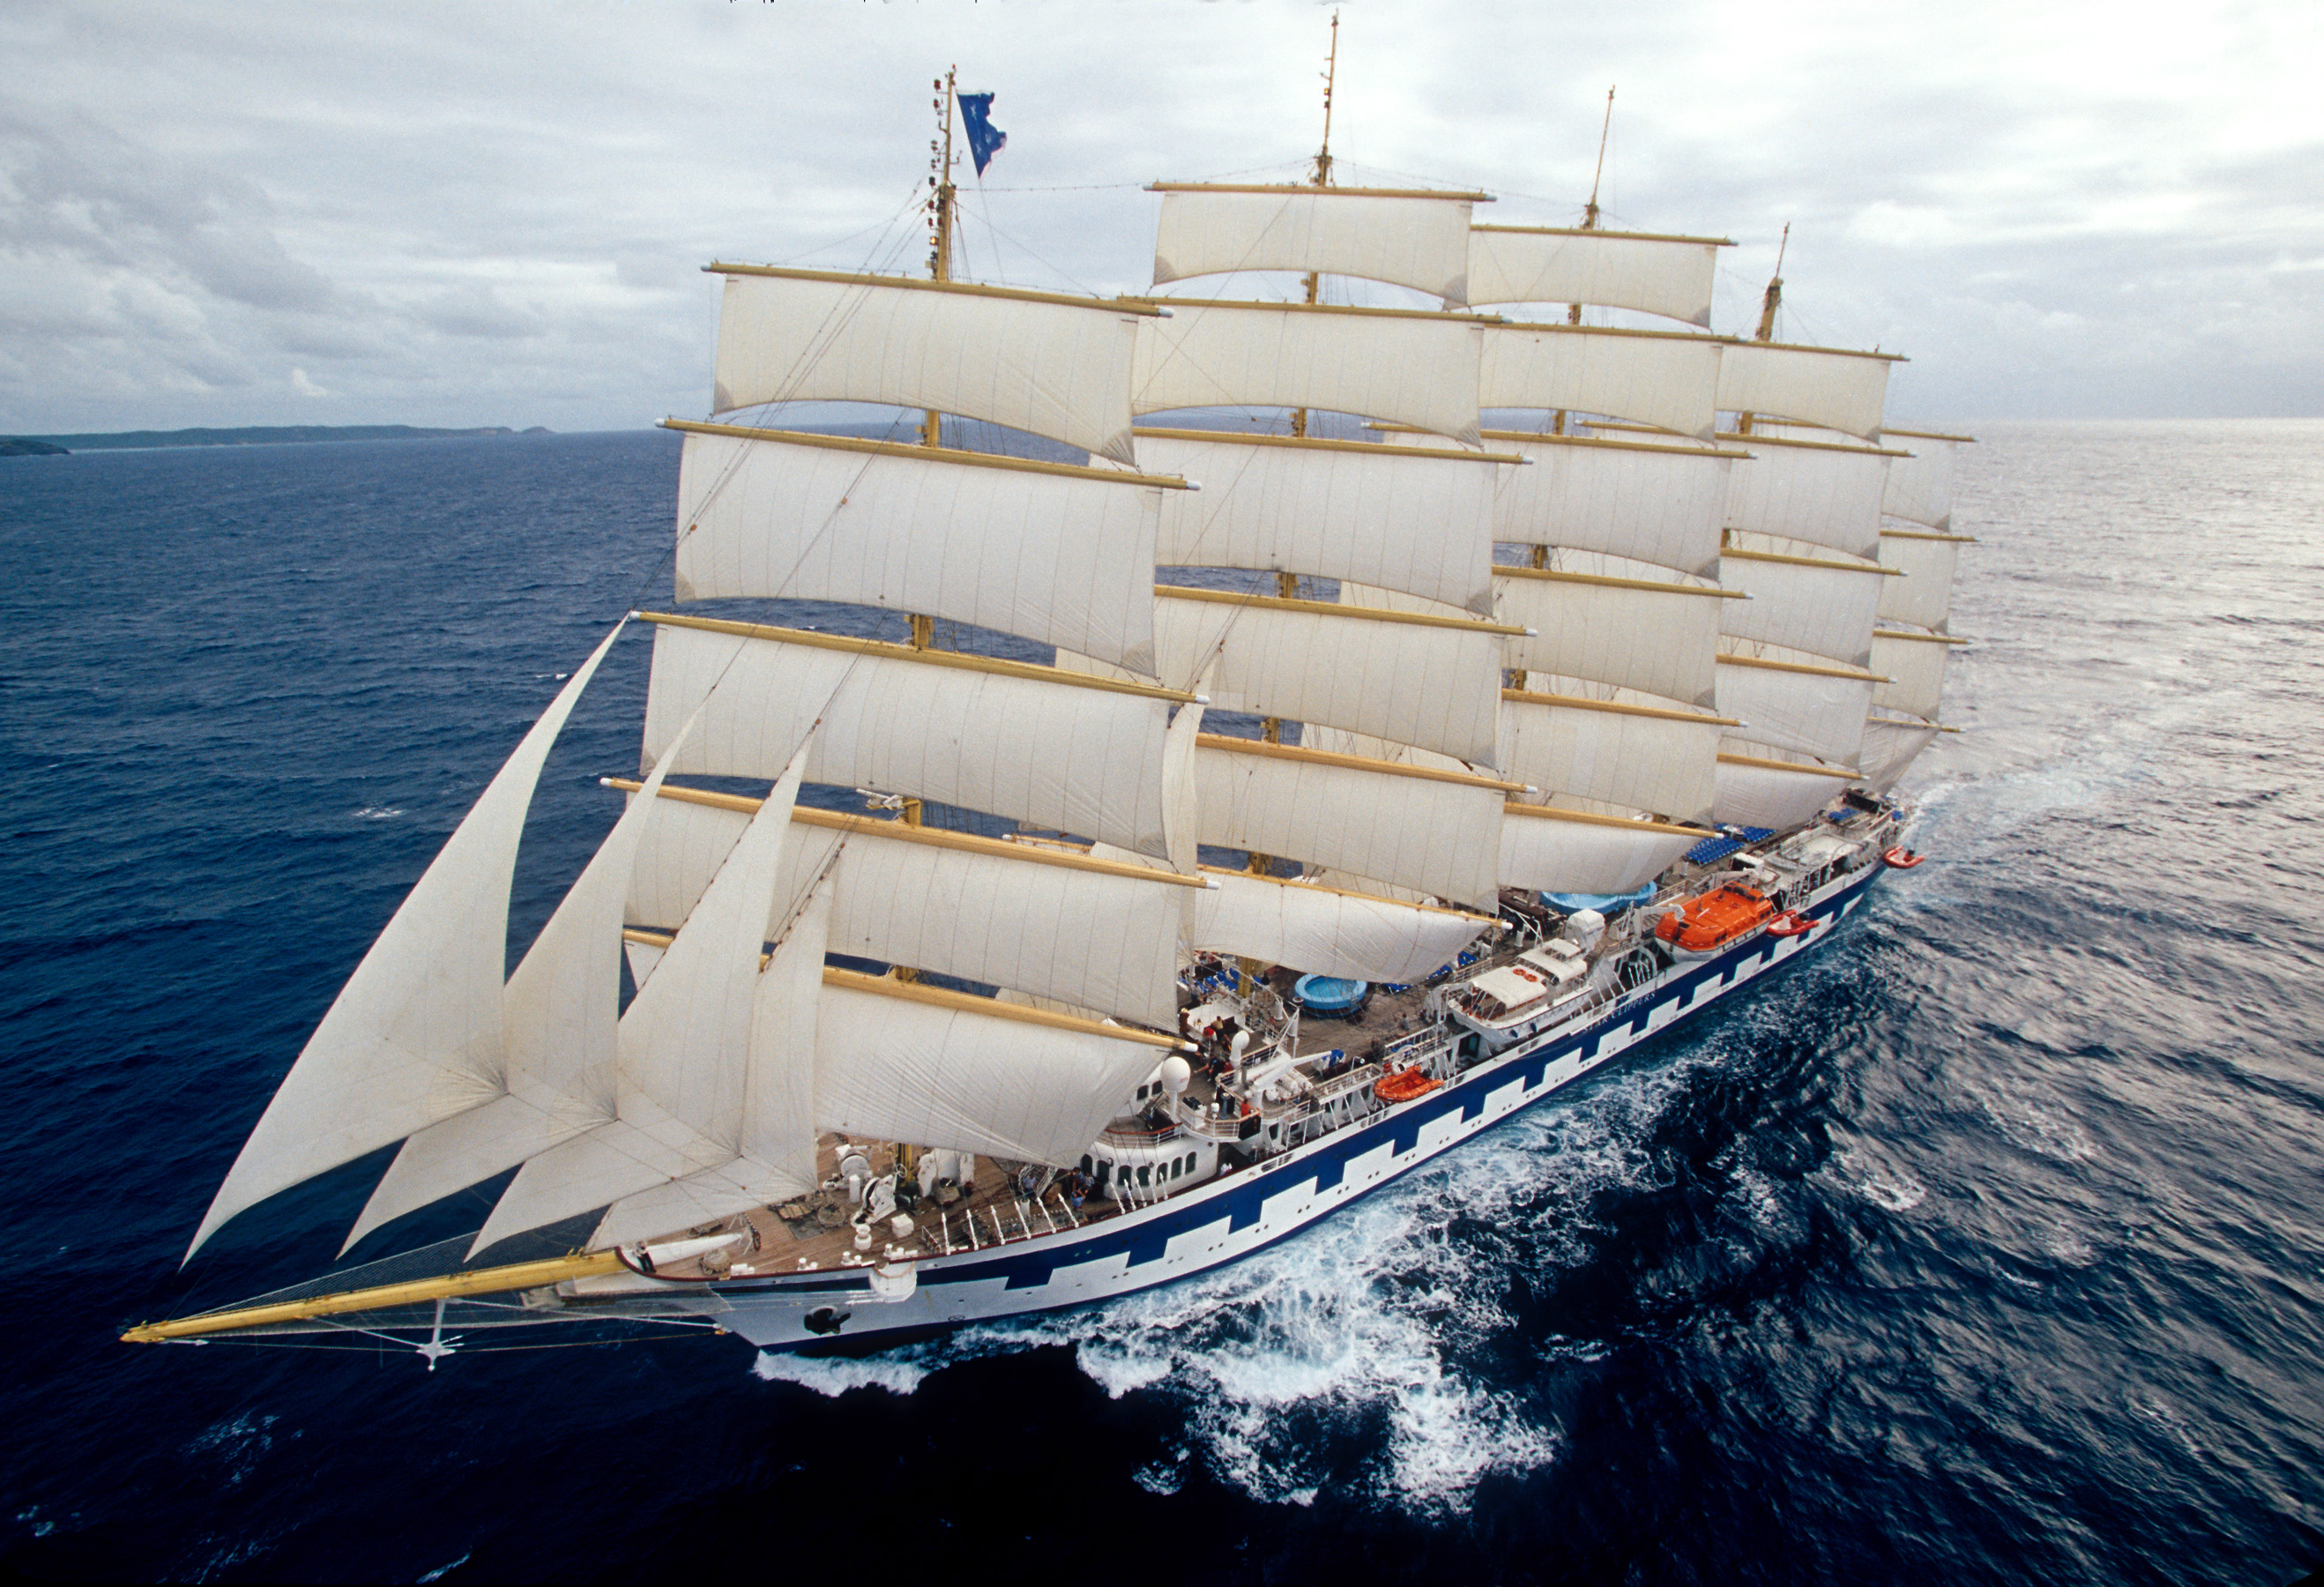 ... Professional Navigation Training on Transatlantic Tall Ship Voyage